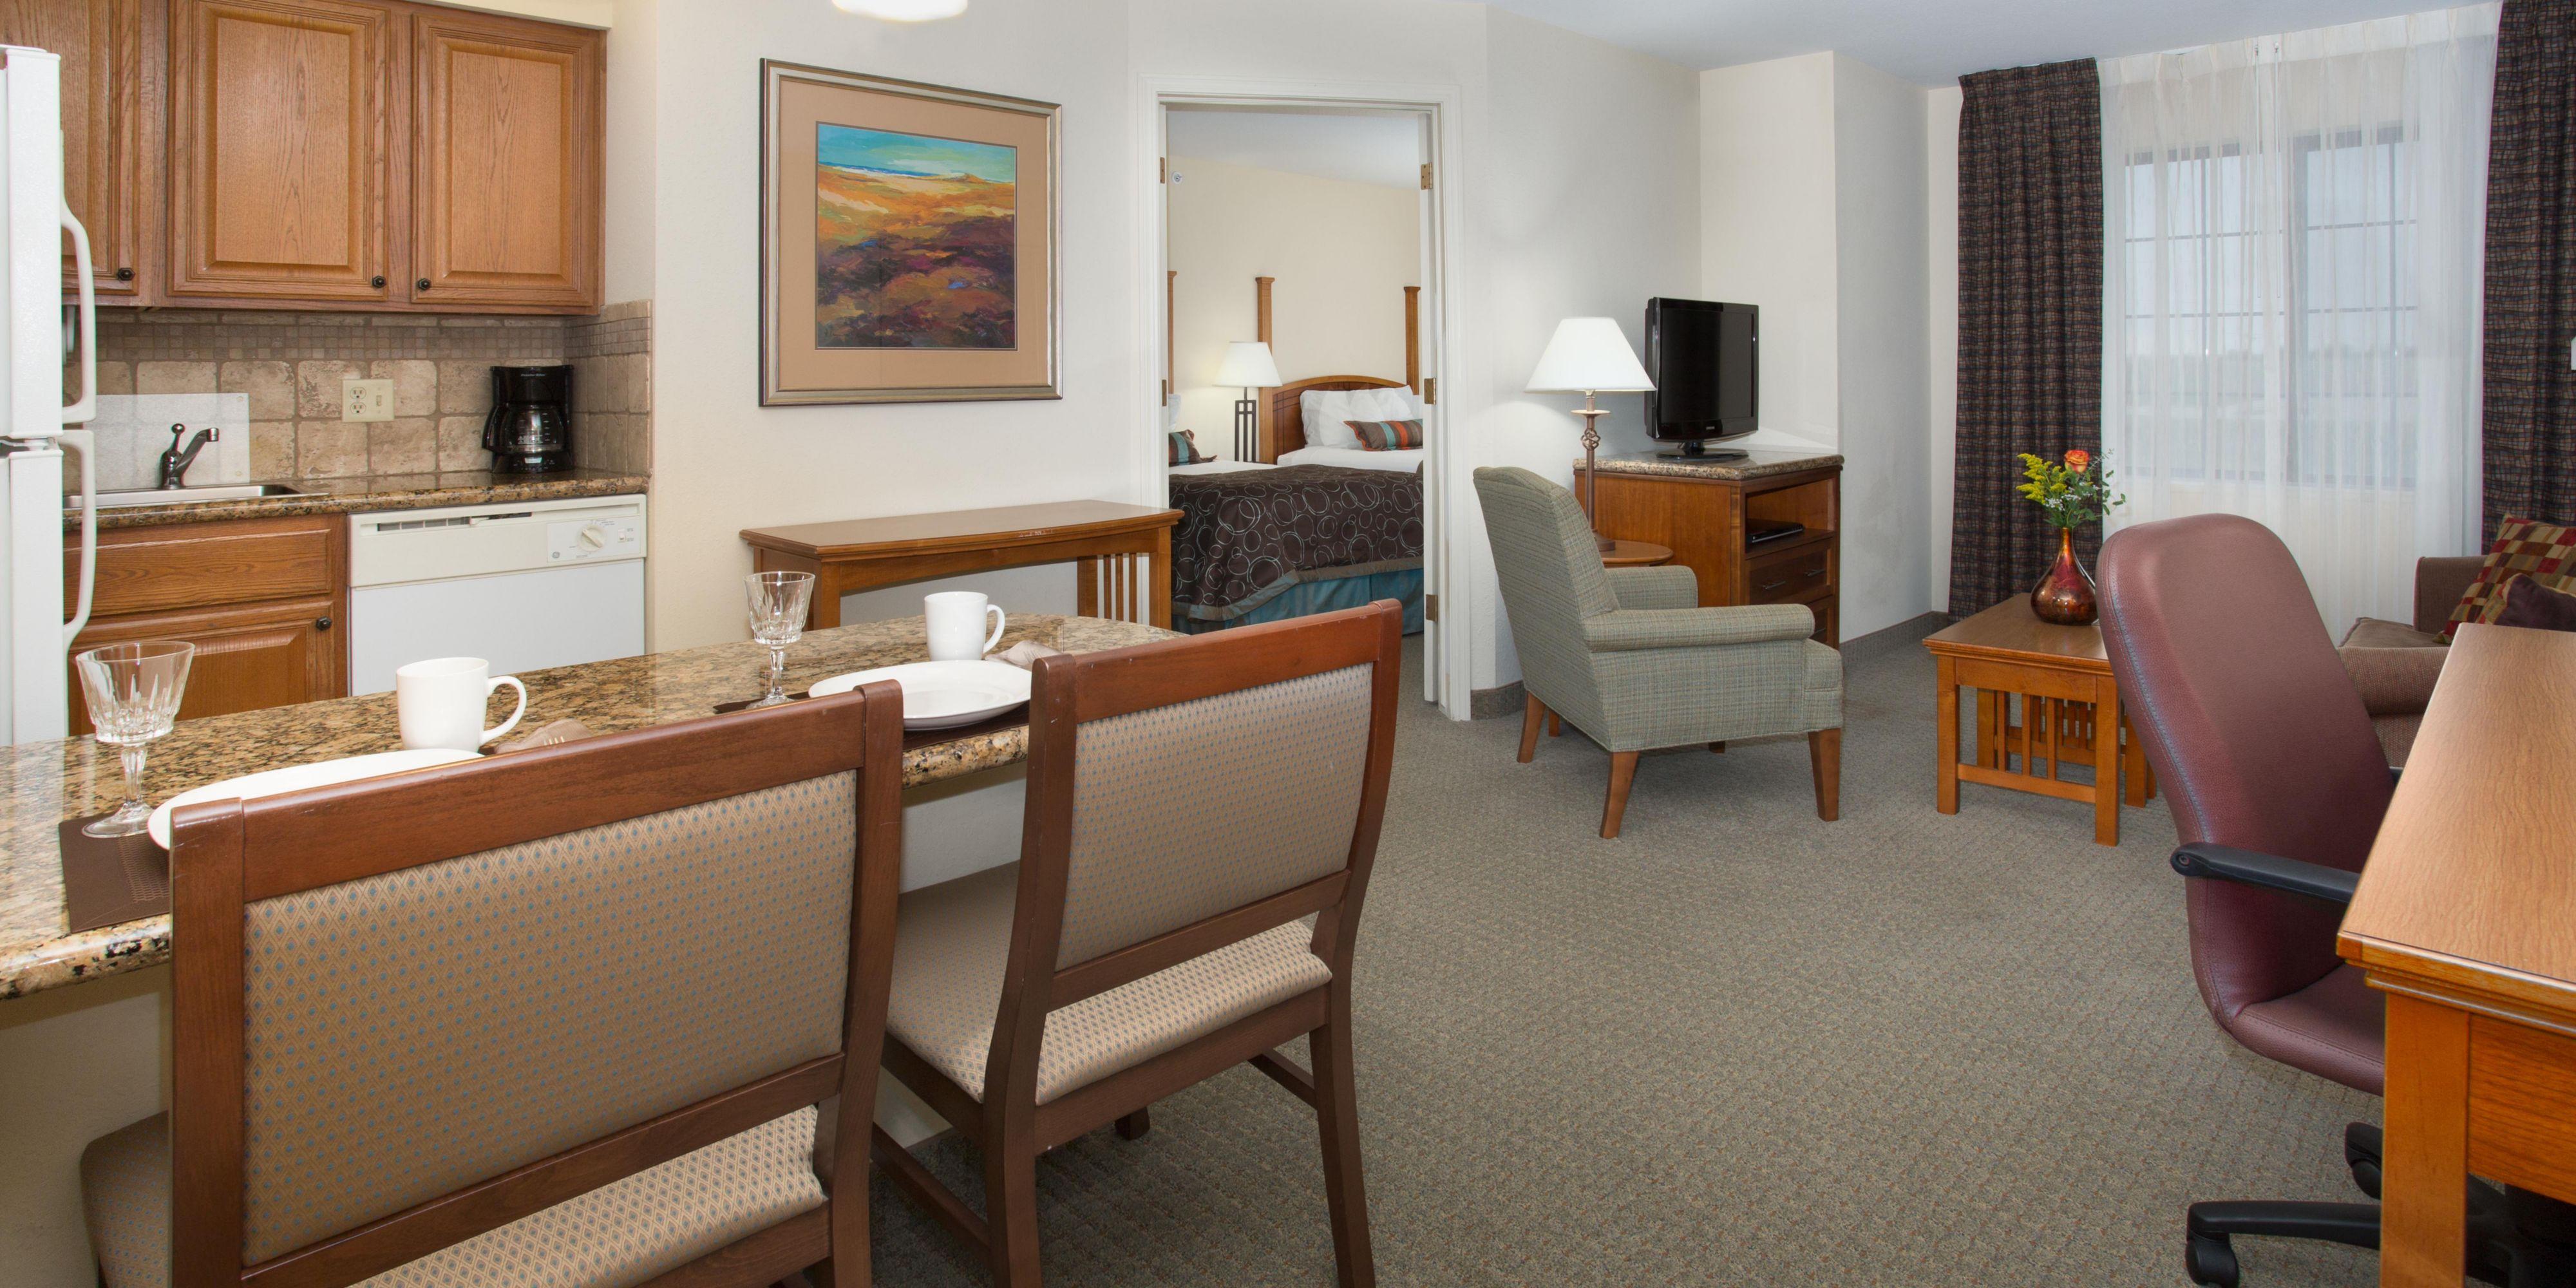 Staybridge Suites Lincoln I-80 image 1